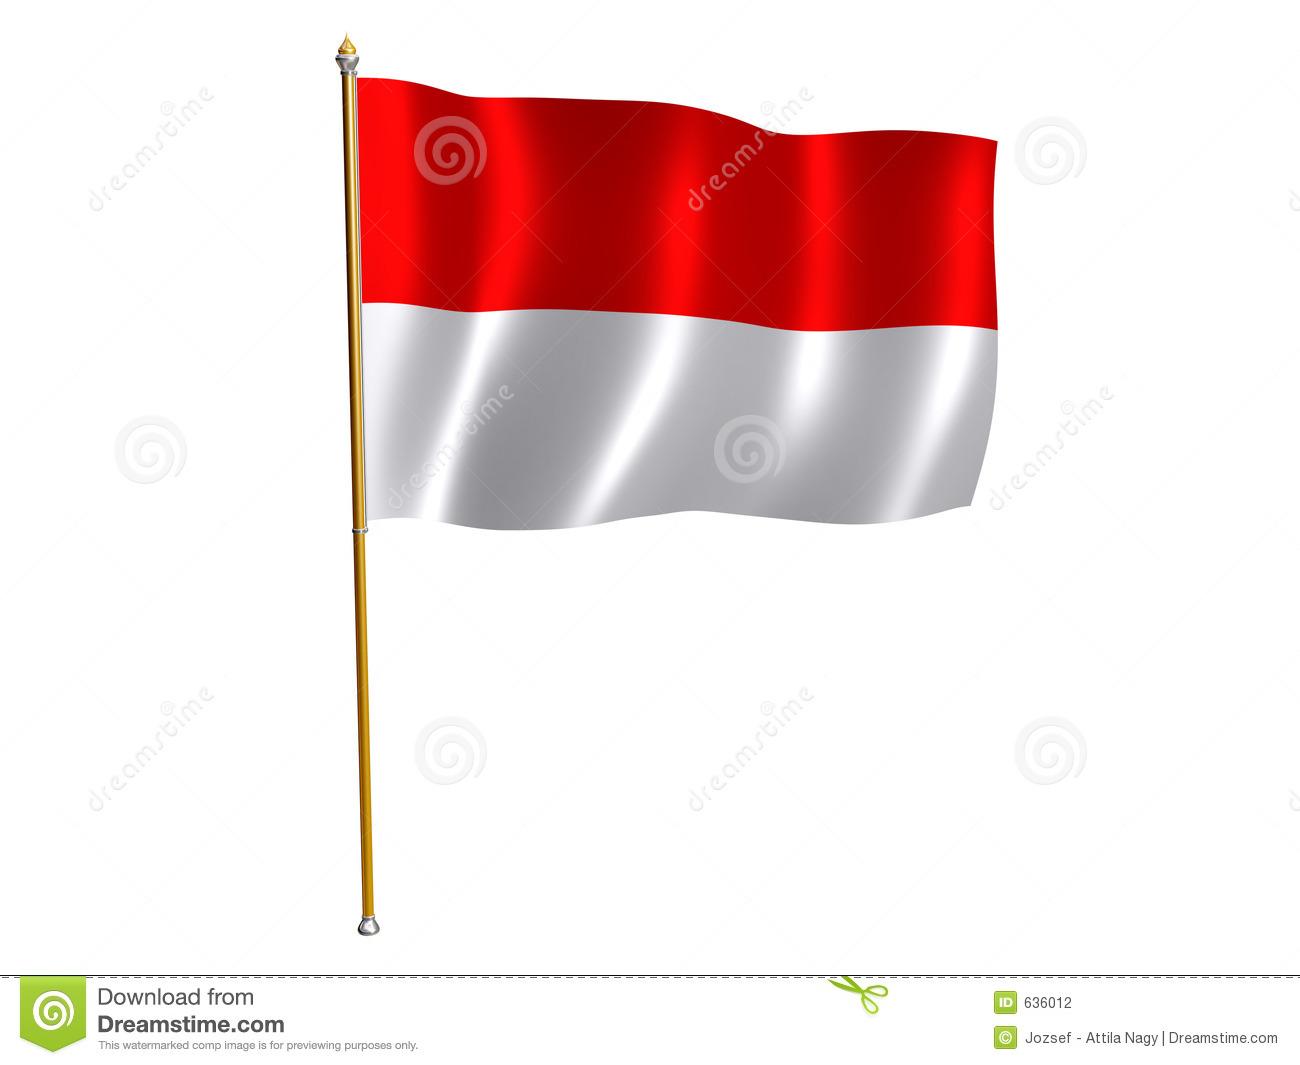 Flag of indonesia clipart graphic transparent download Flag of indonesia clipart - ClipartFest graphic transparent download